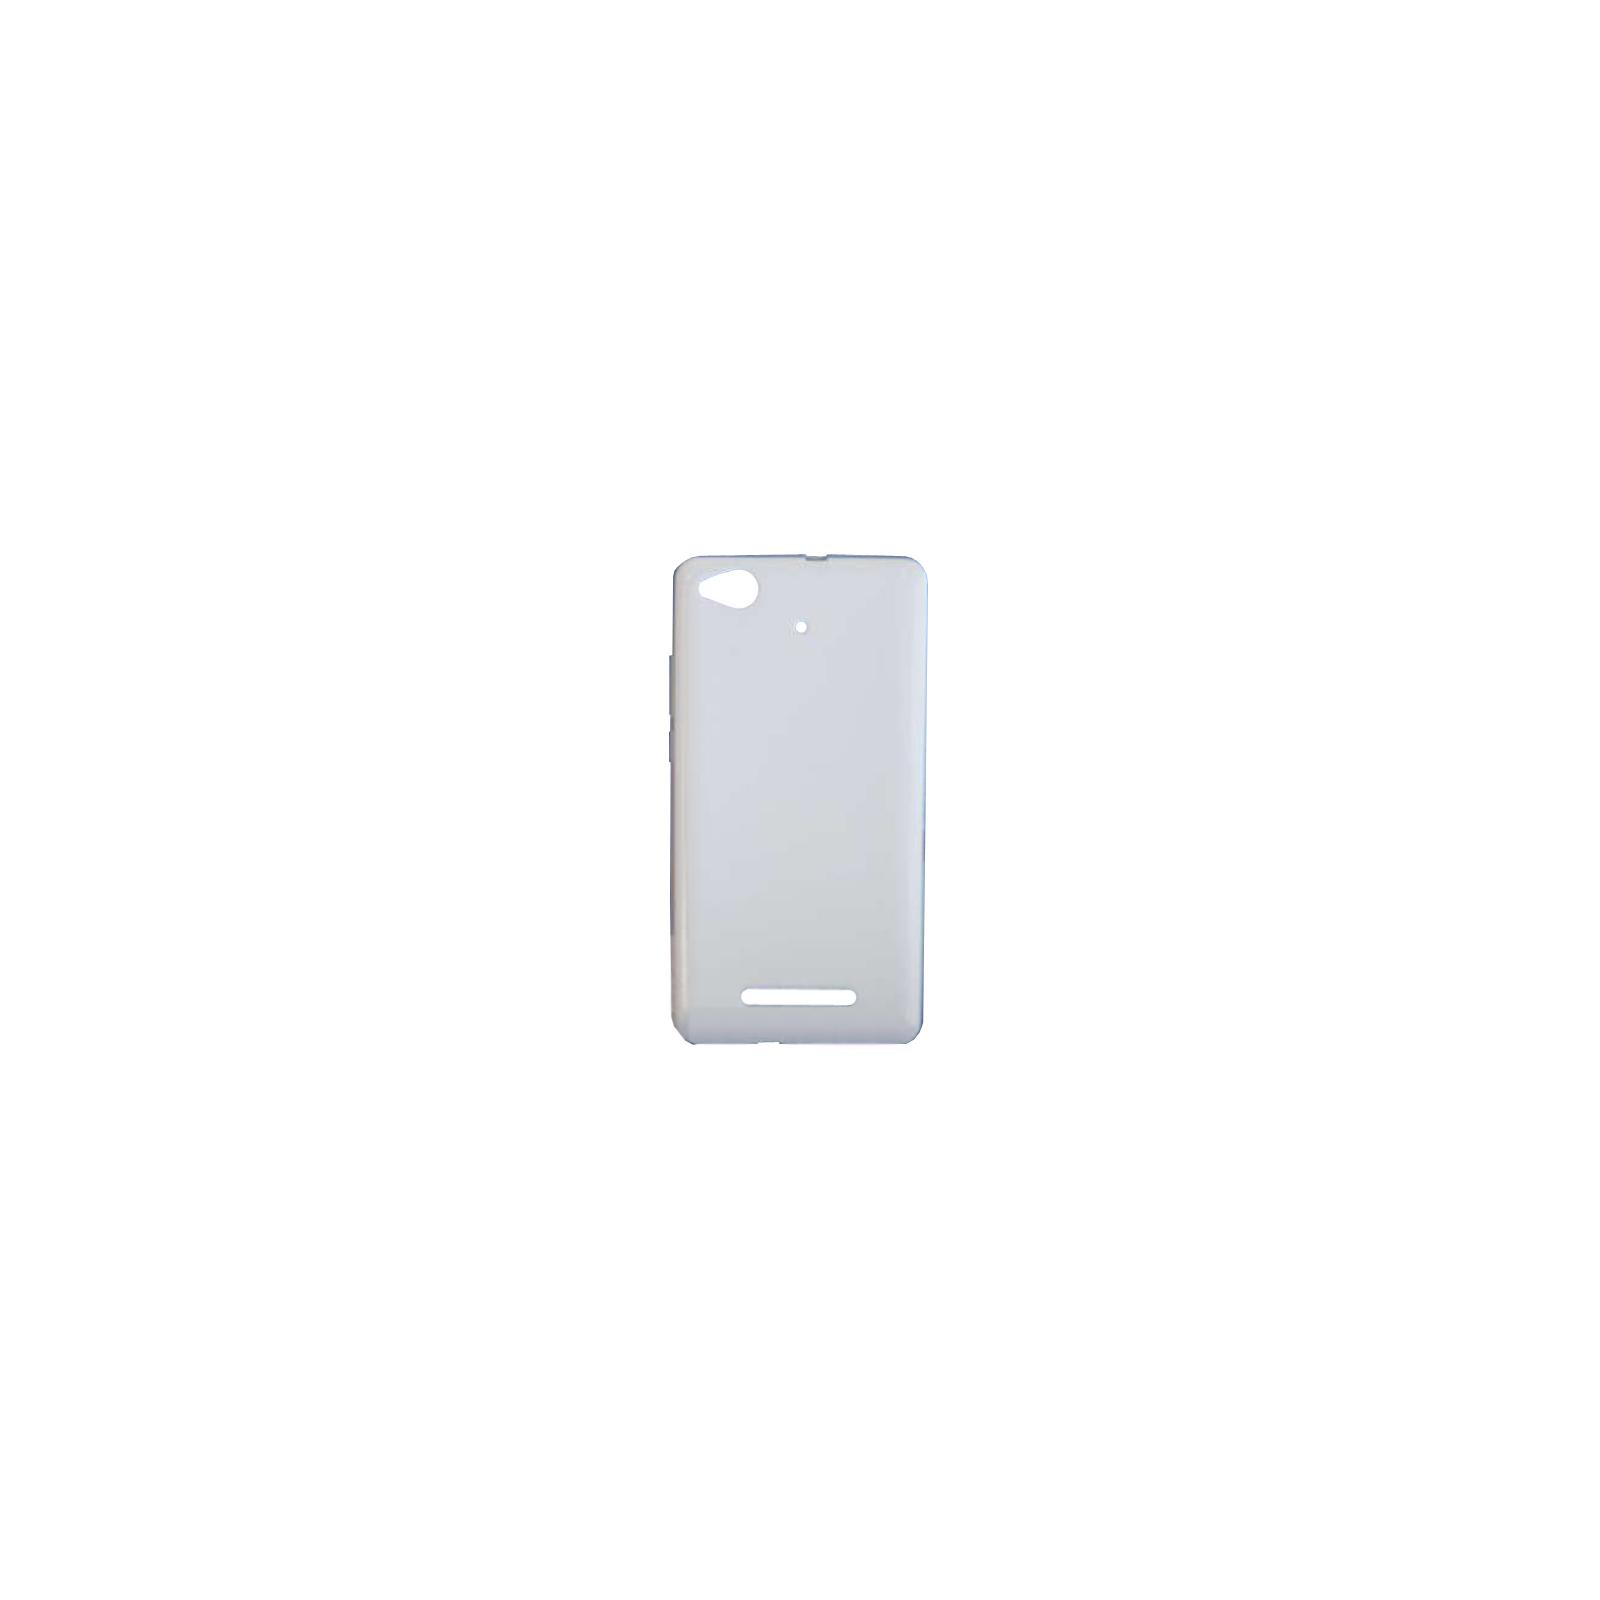 Чехол для моб. телефона Drobak для Fly IQ457/Elastic PU/Clear (214735)